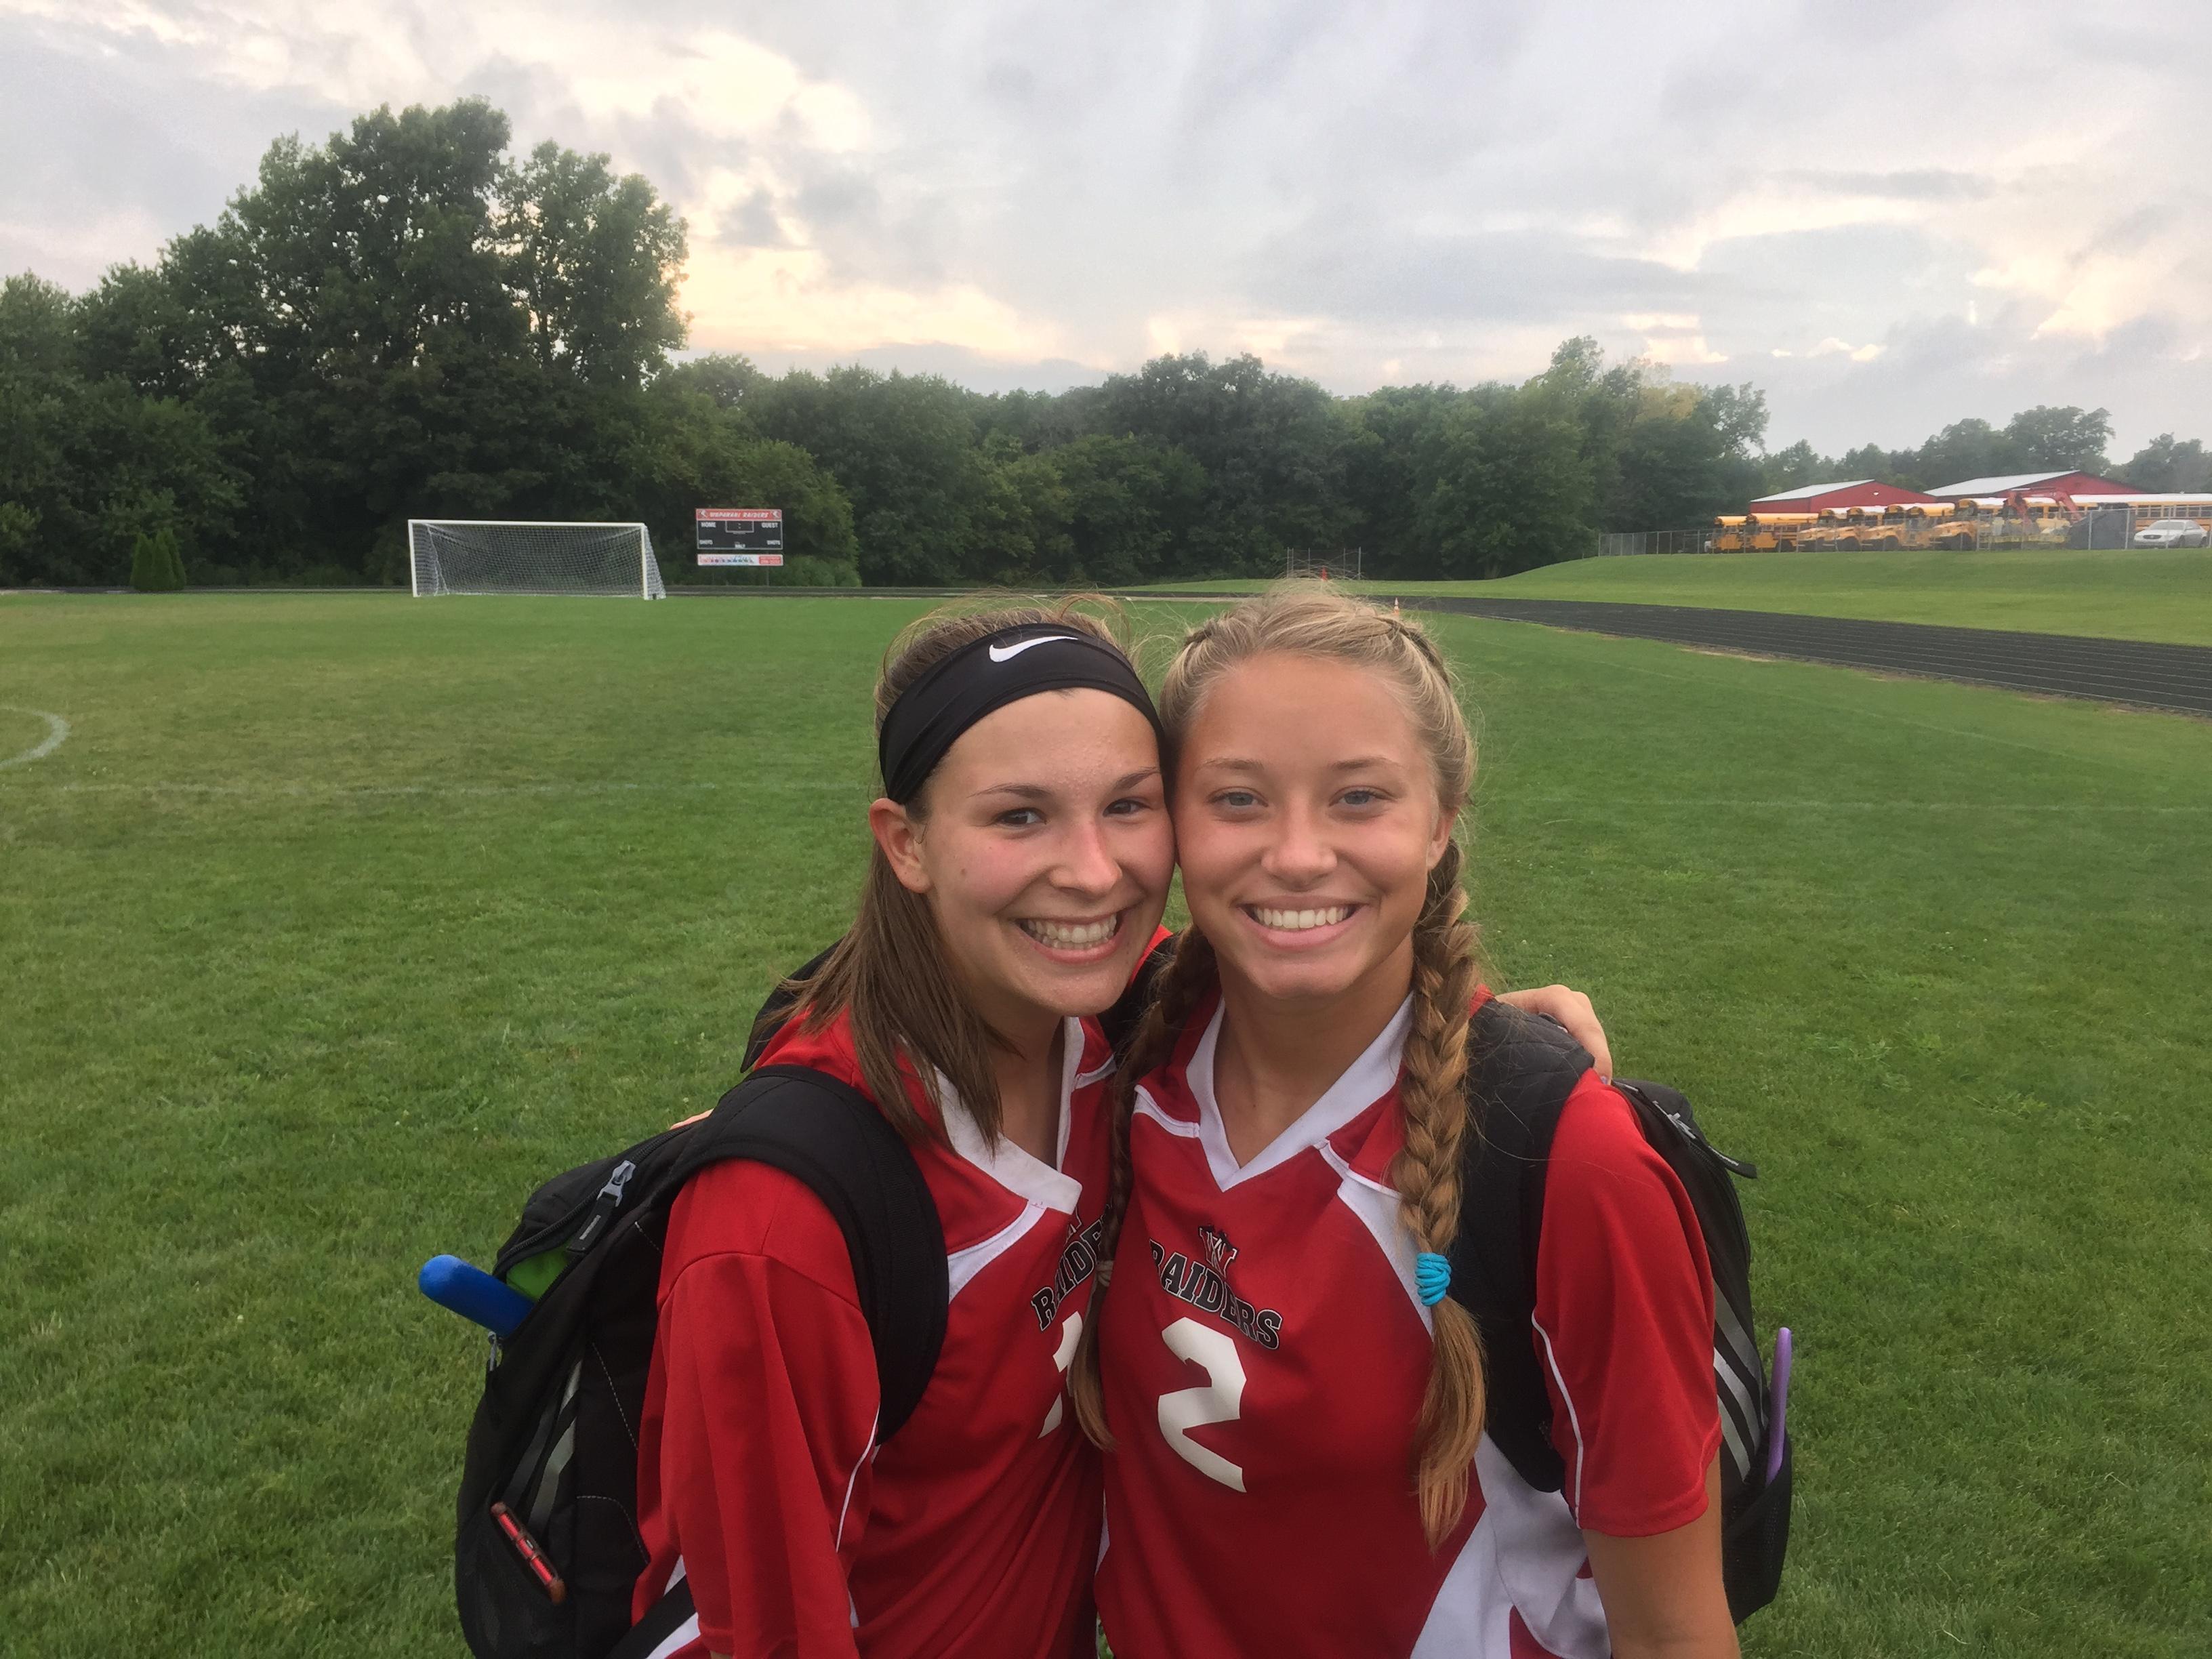 Raider Girls Win; Dornick Scores 4 Goals